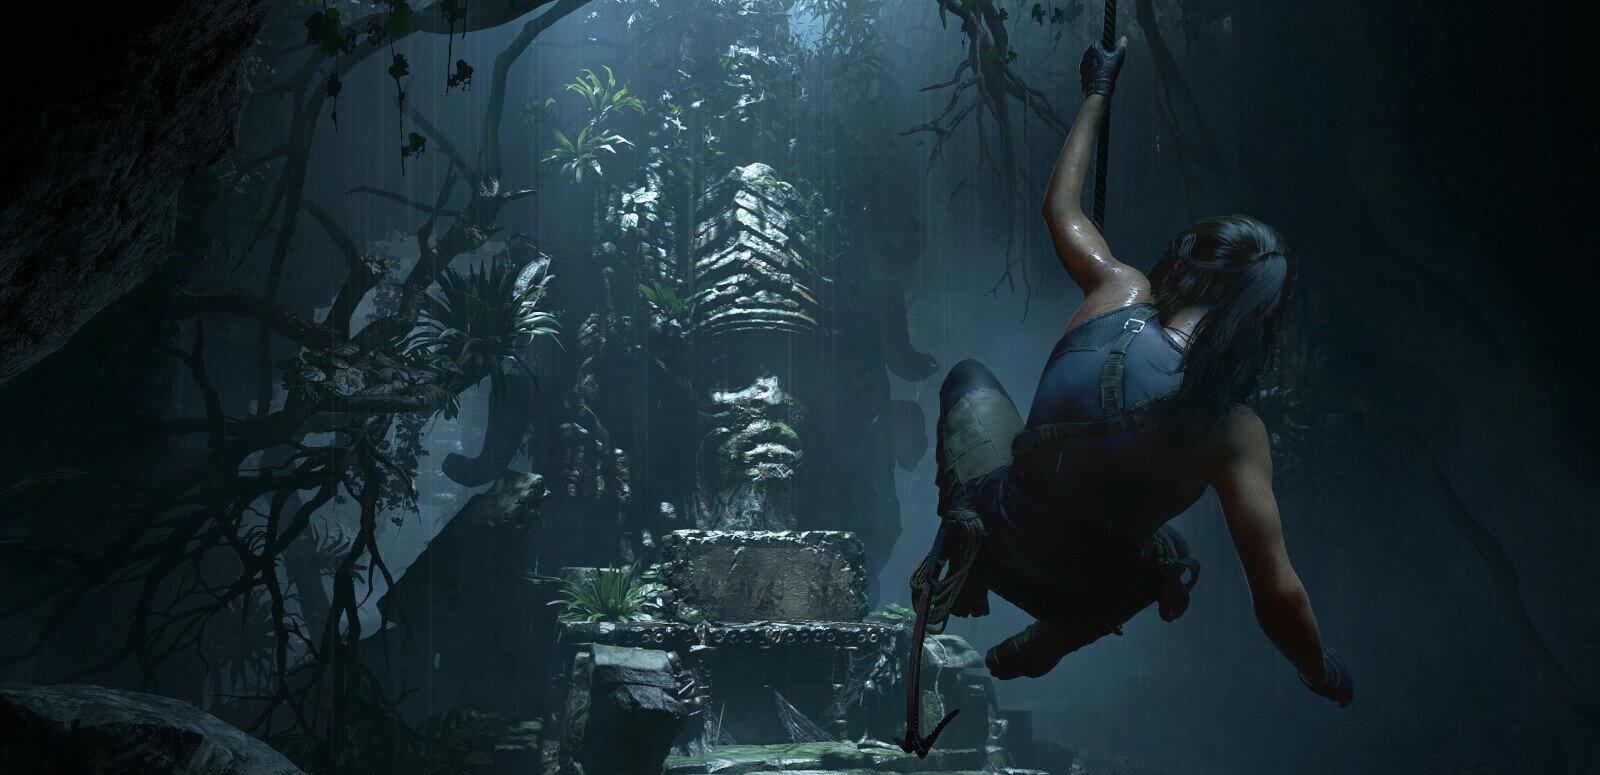 Le ray tracing et DLSS de NVIDIA disponibles dans Shadow of the Tomb Raider